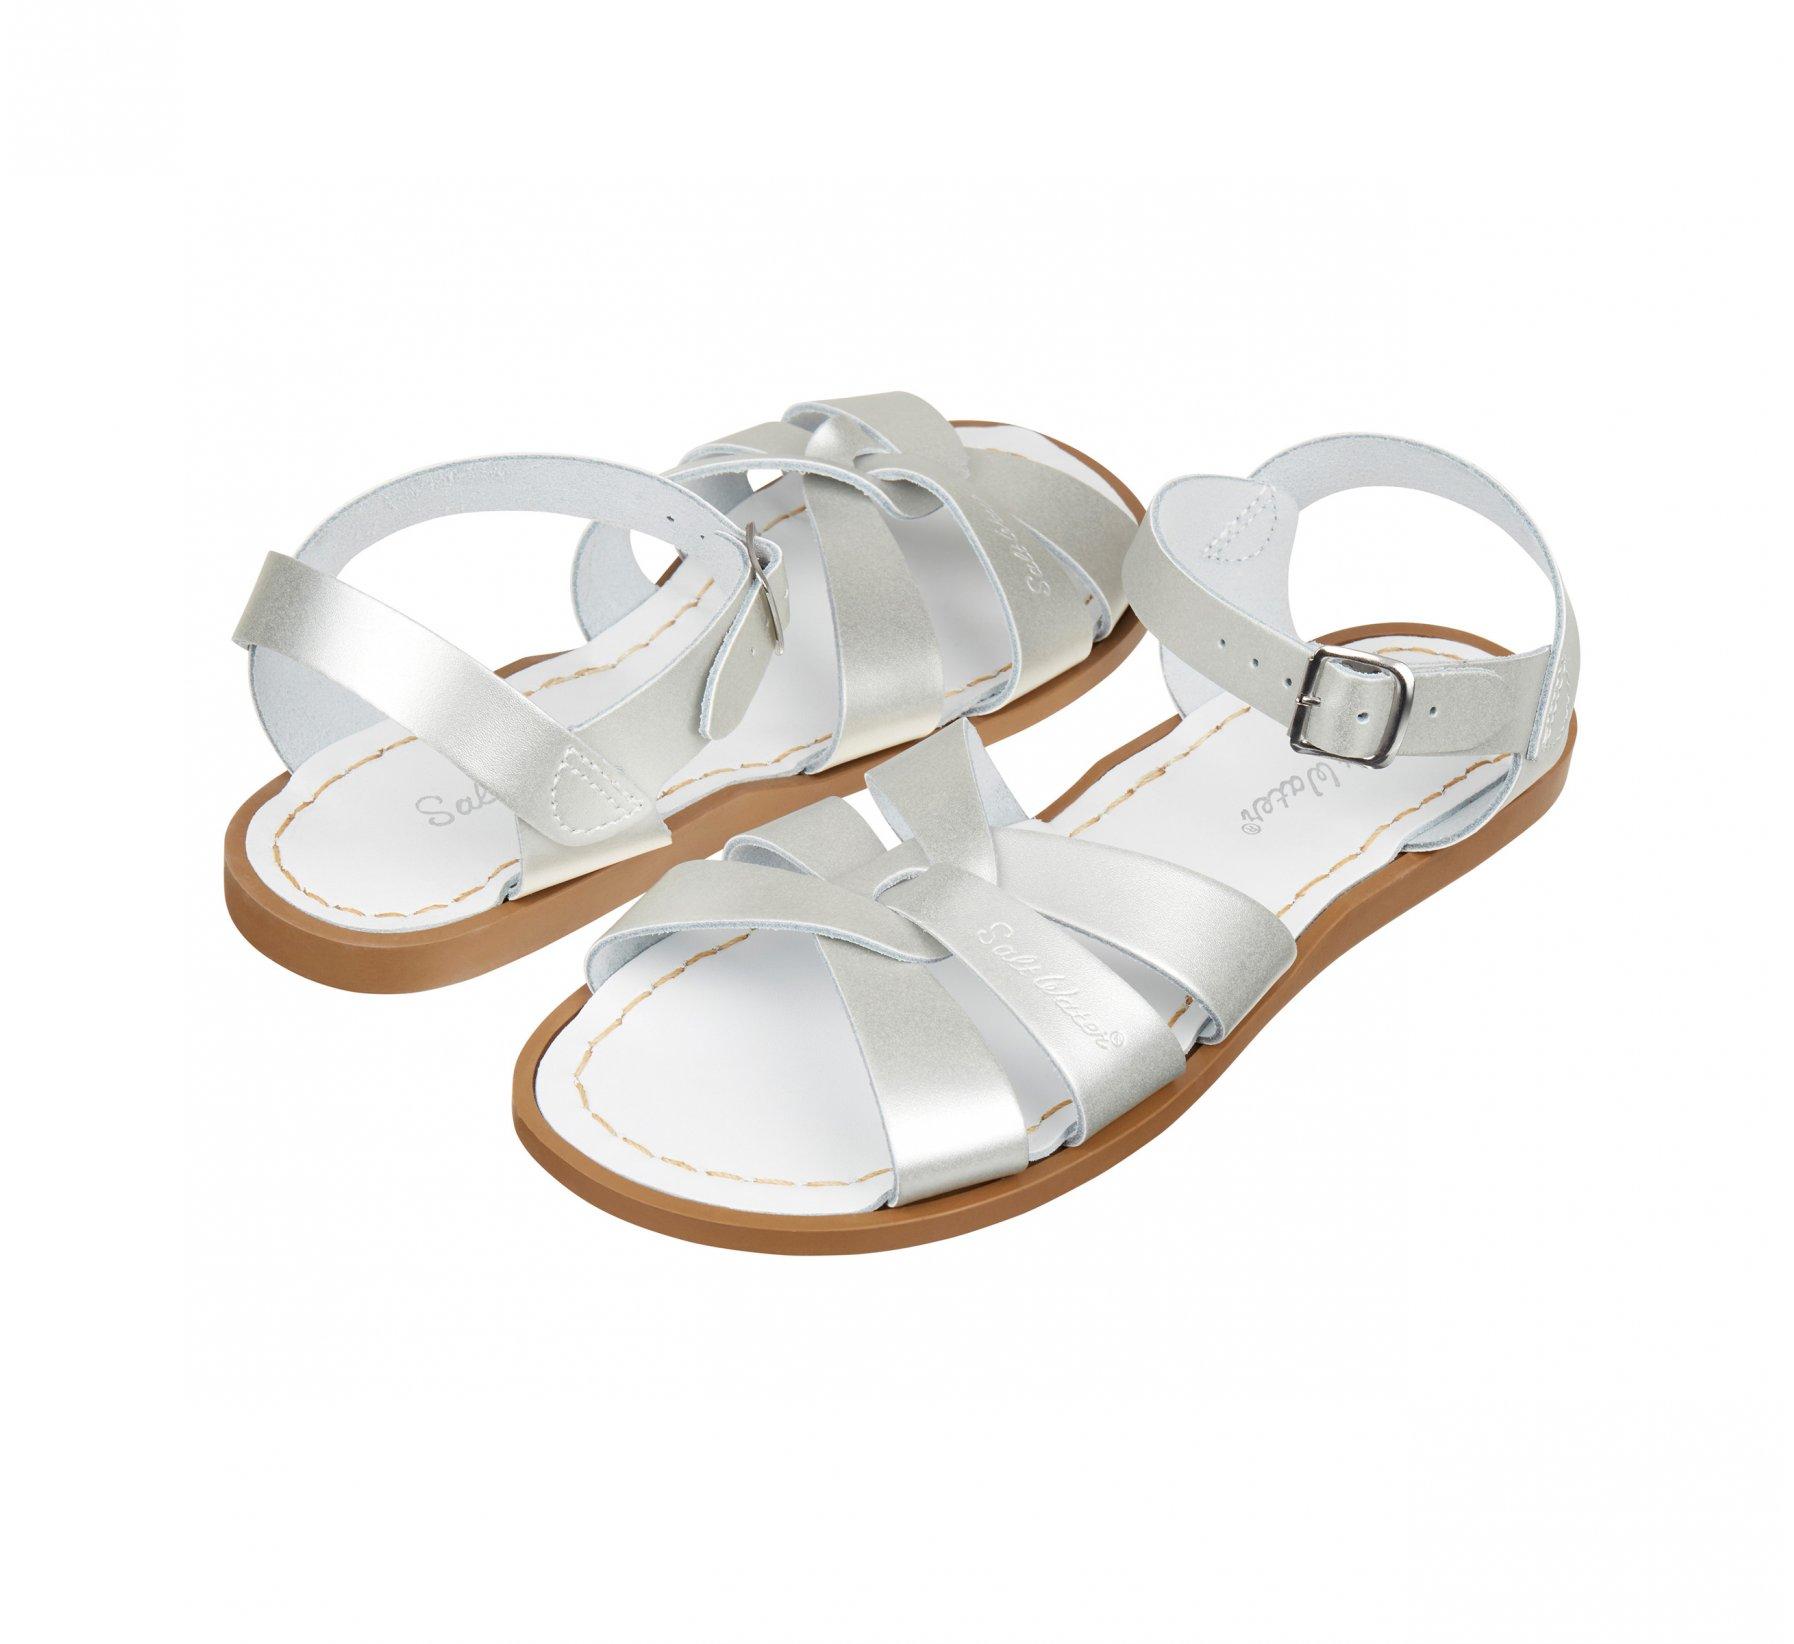 Original Argenté - Salt Water Sandals